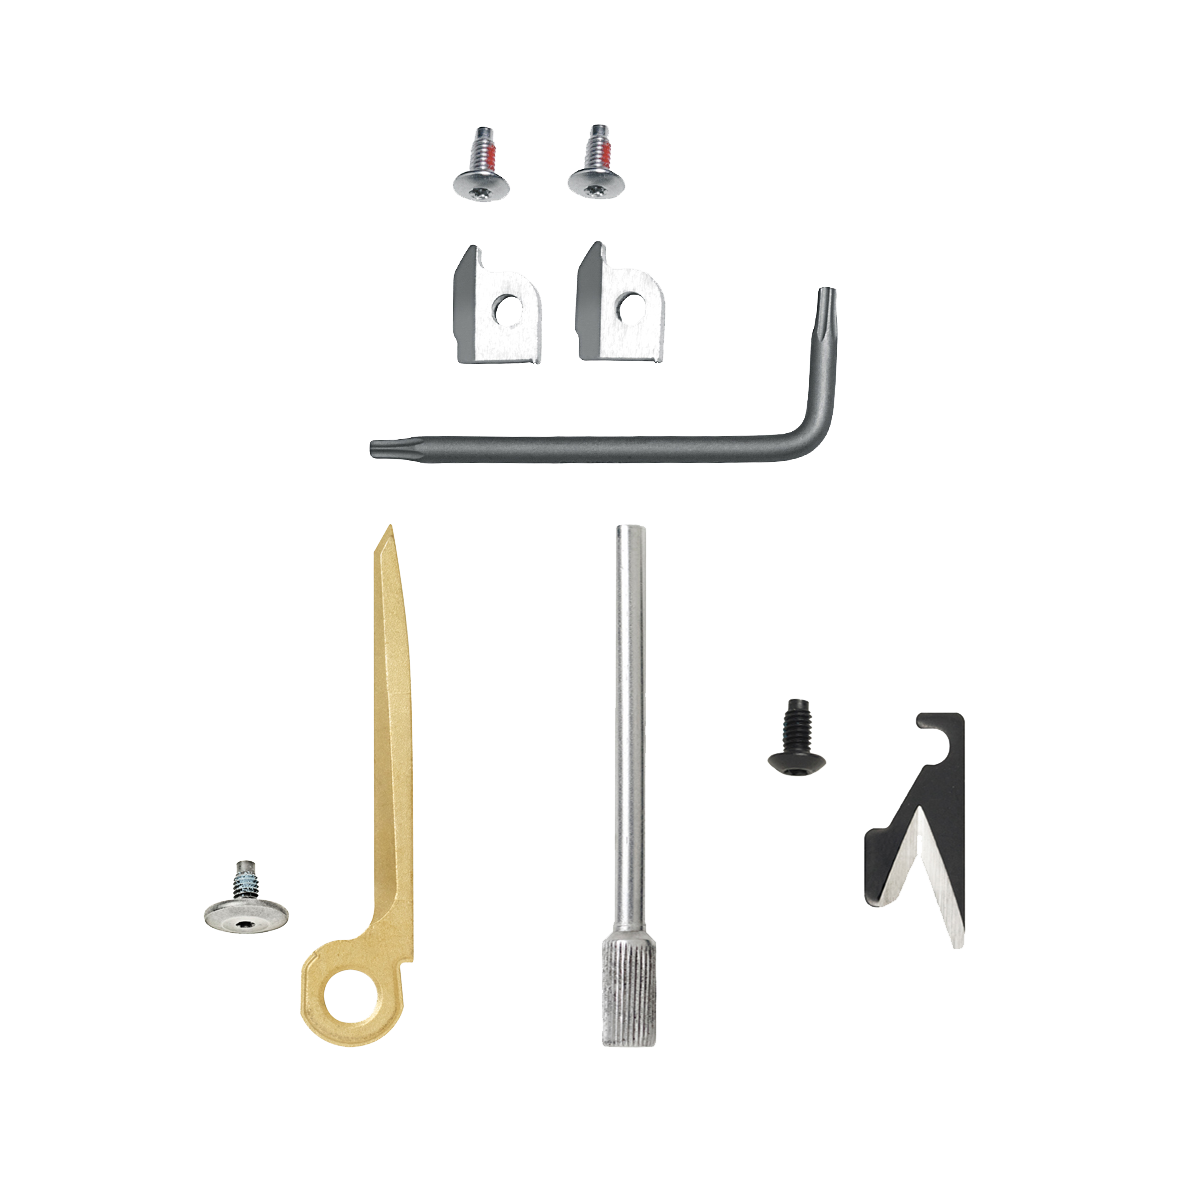 Image of MUT® Accessory Kit